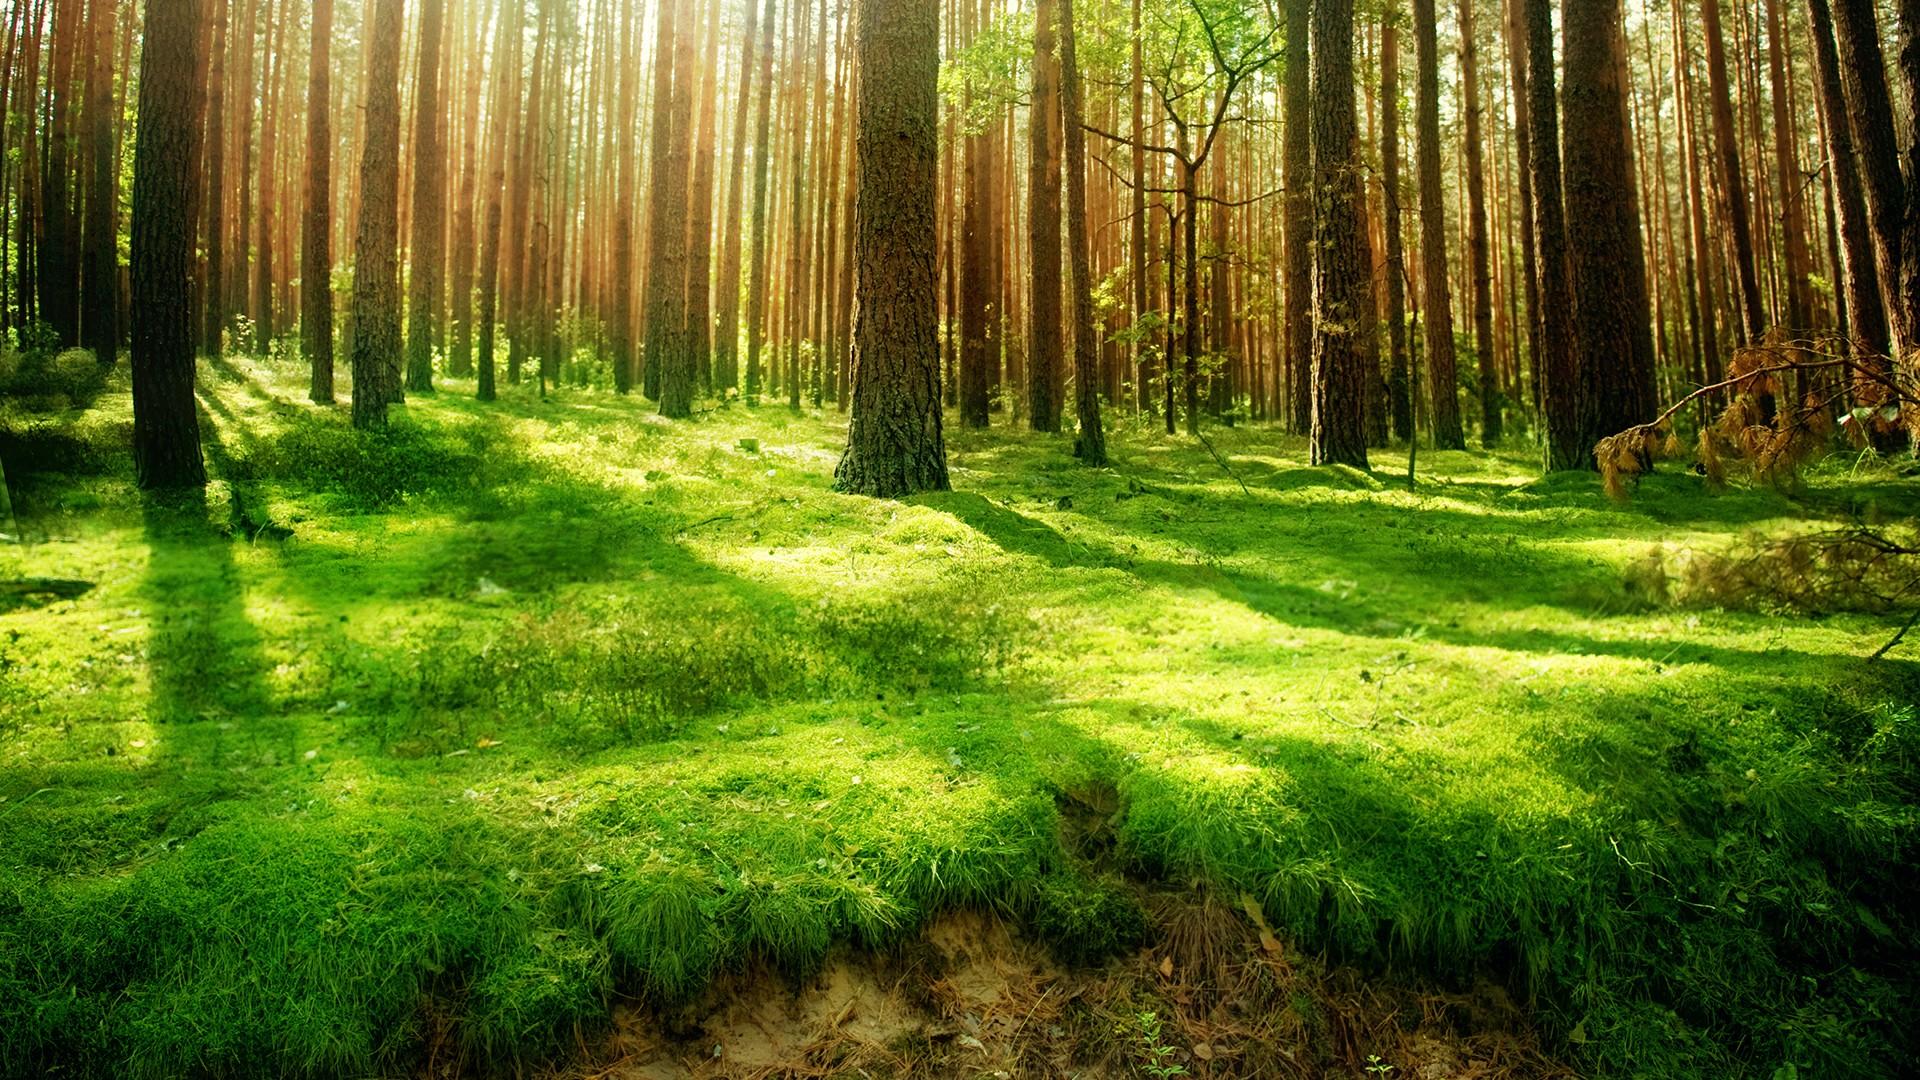 Sunlight In The Deep Forest Wallpaper | Wallpaper Studio 10 | Tens ...